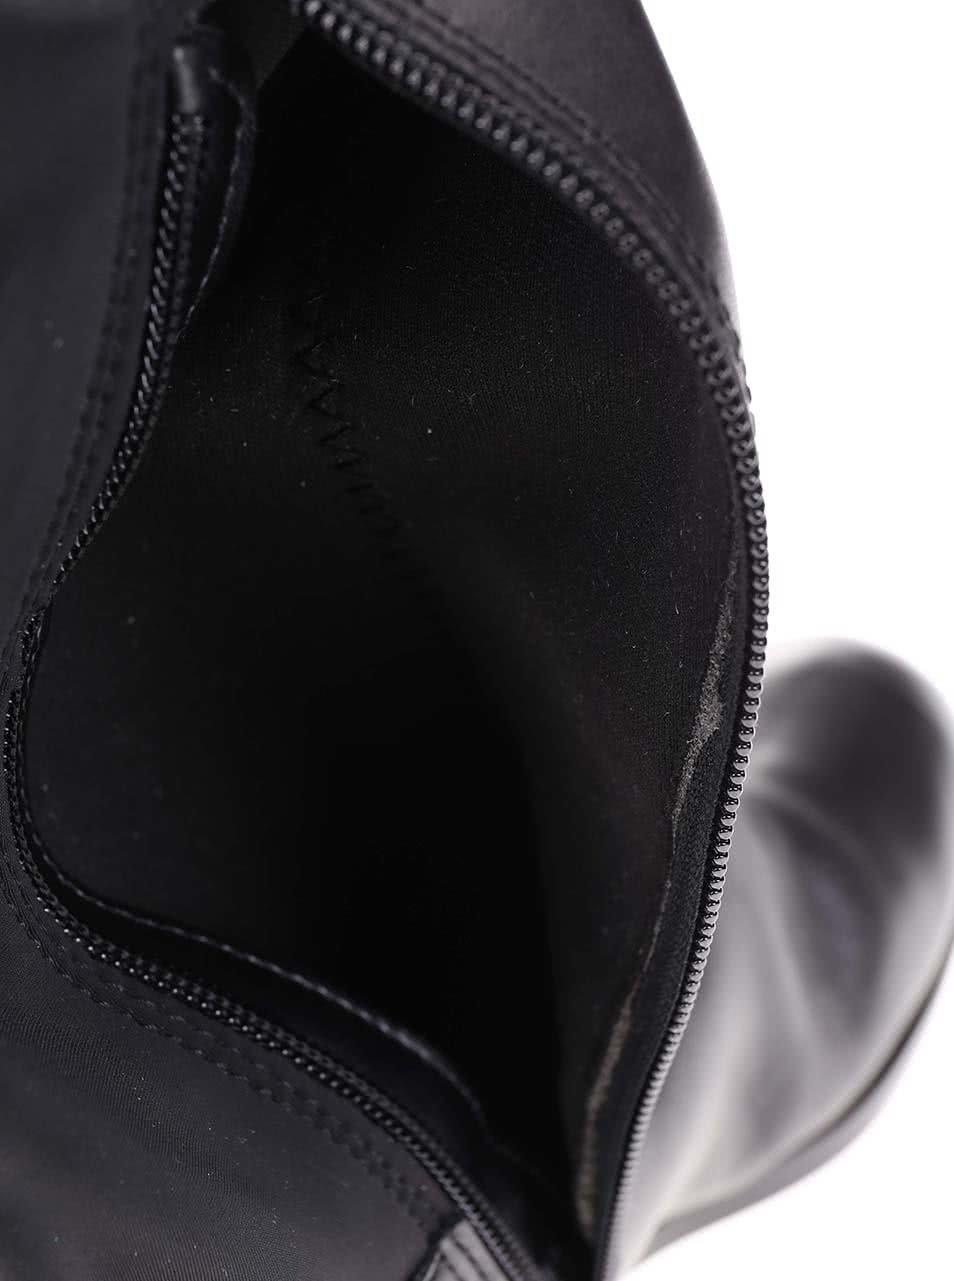 ecfbea28d5 Čierne kožené vysoké čižmy ALDO Dyna ...